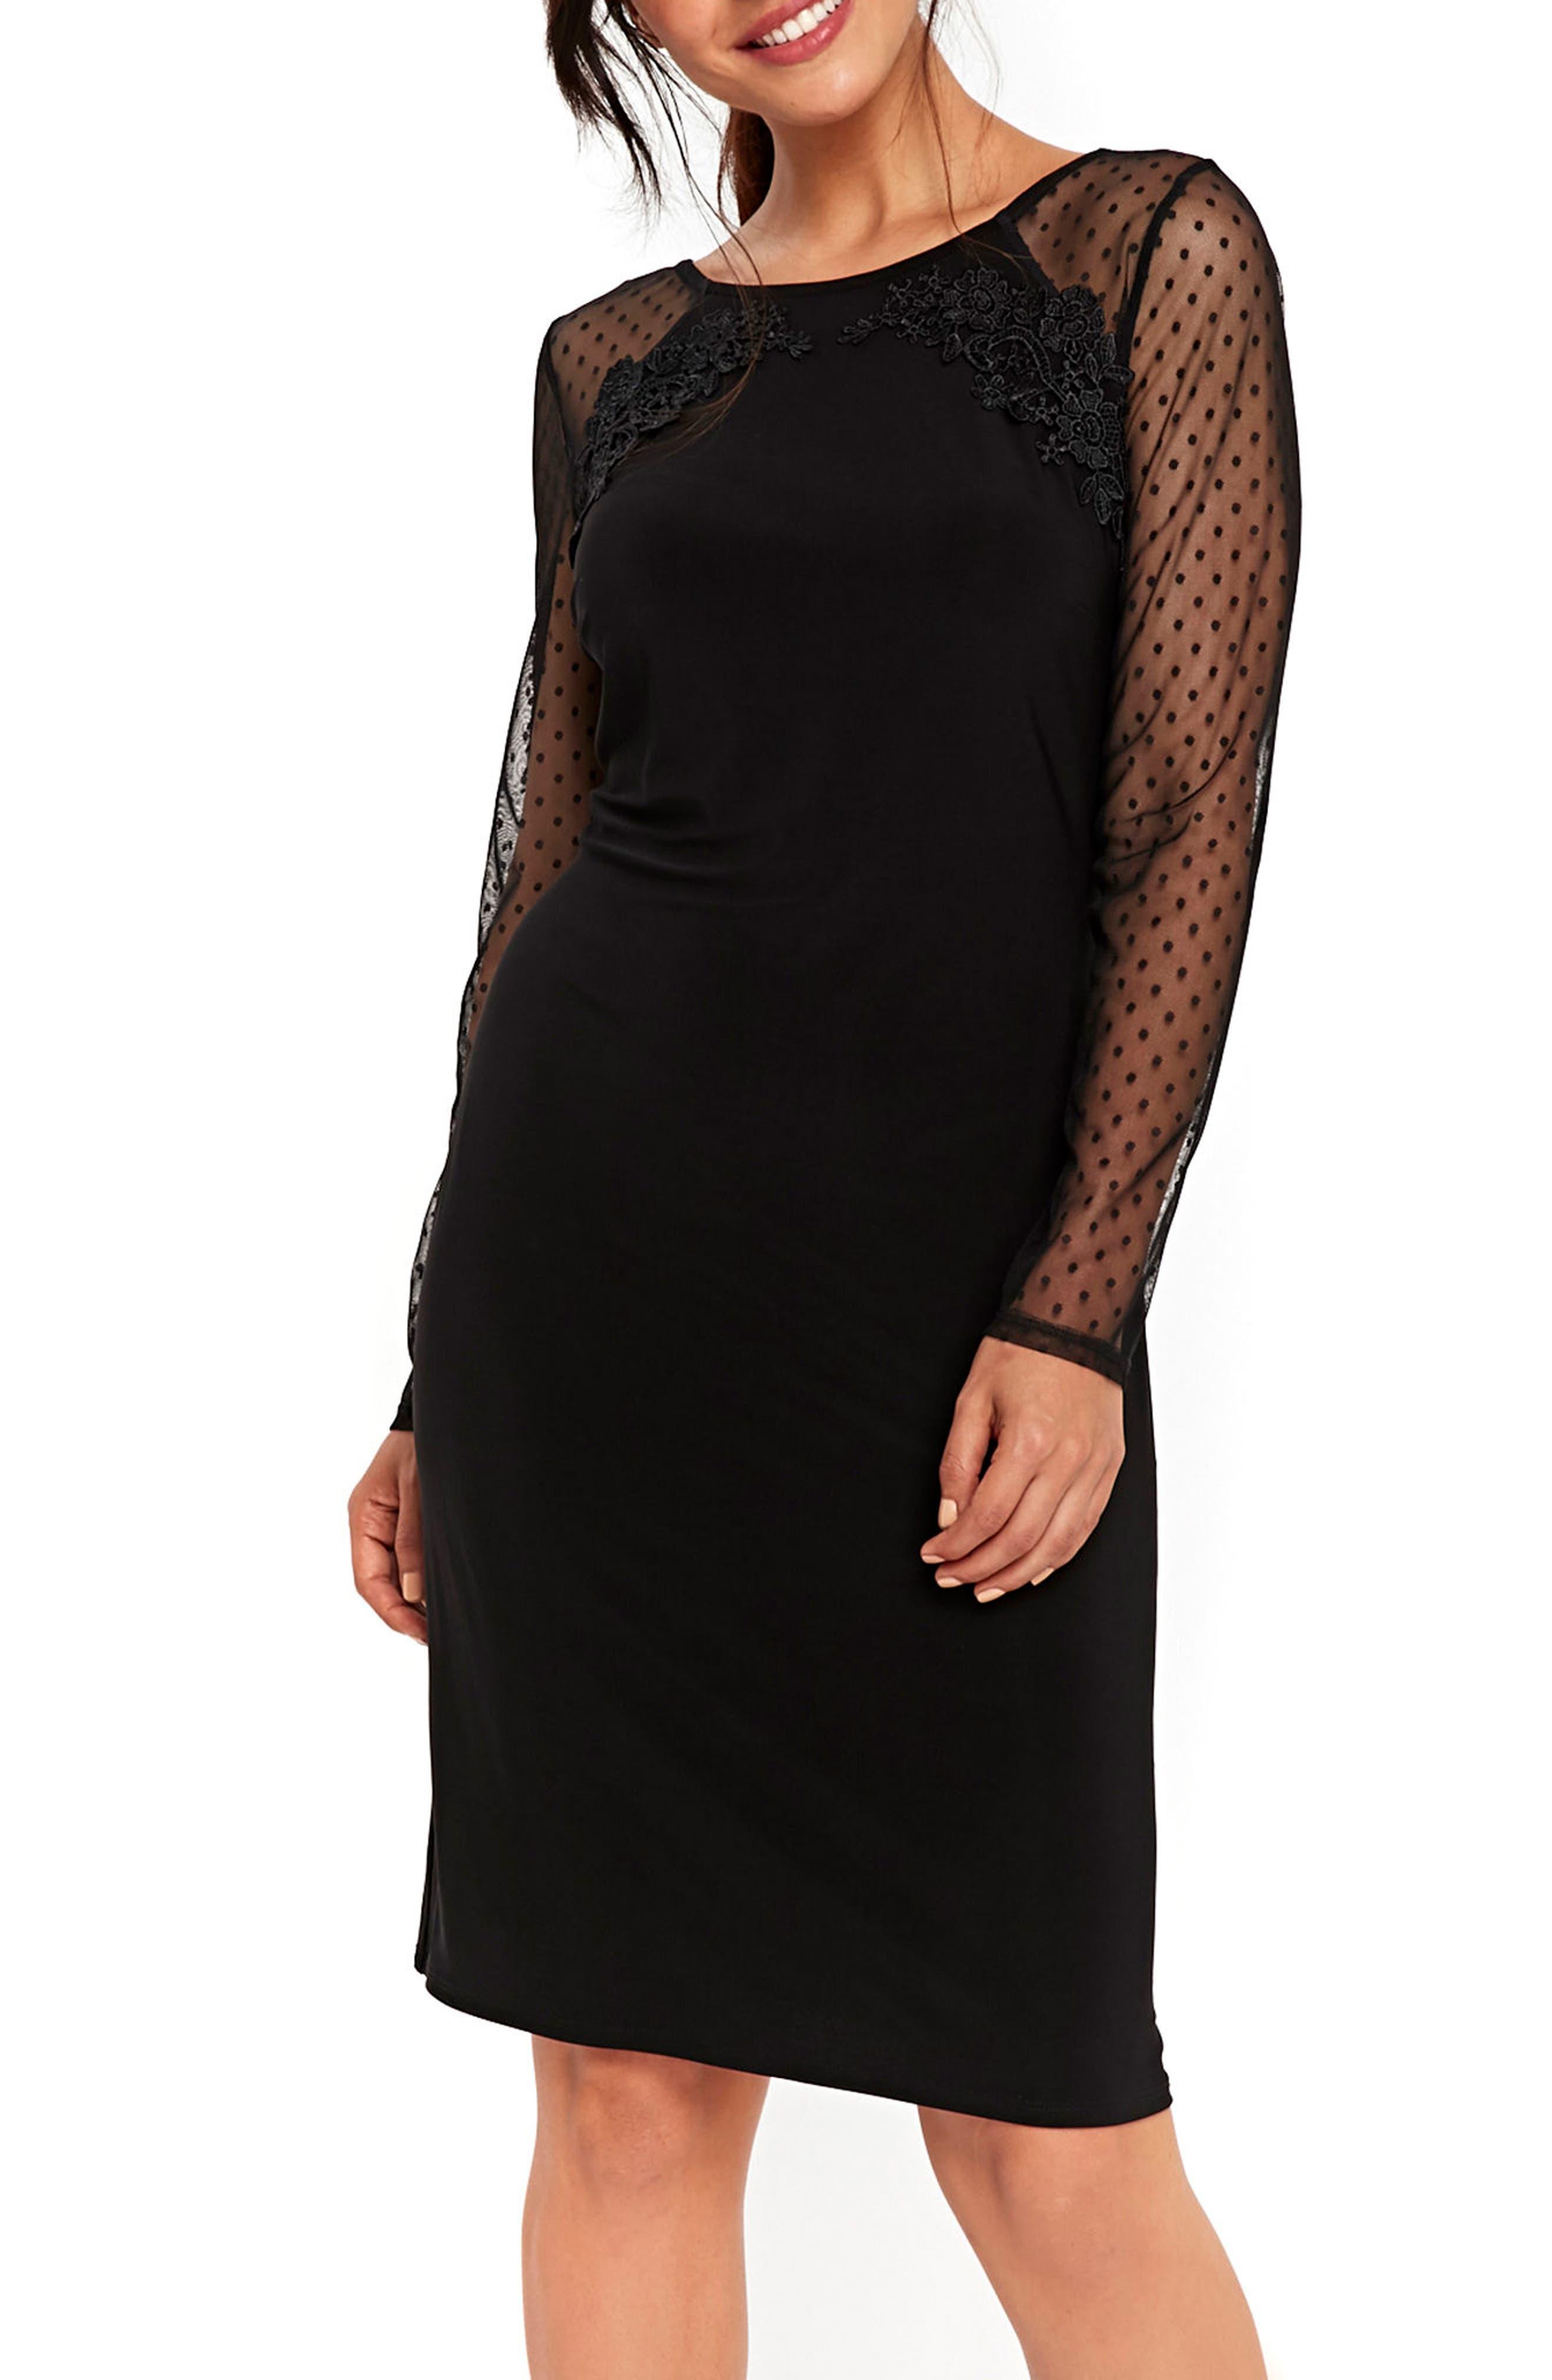 Dot Mesh Sleeve Sheath Dress,                             Main thumbnail 1, color,                             Black